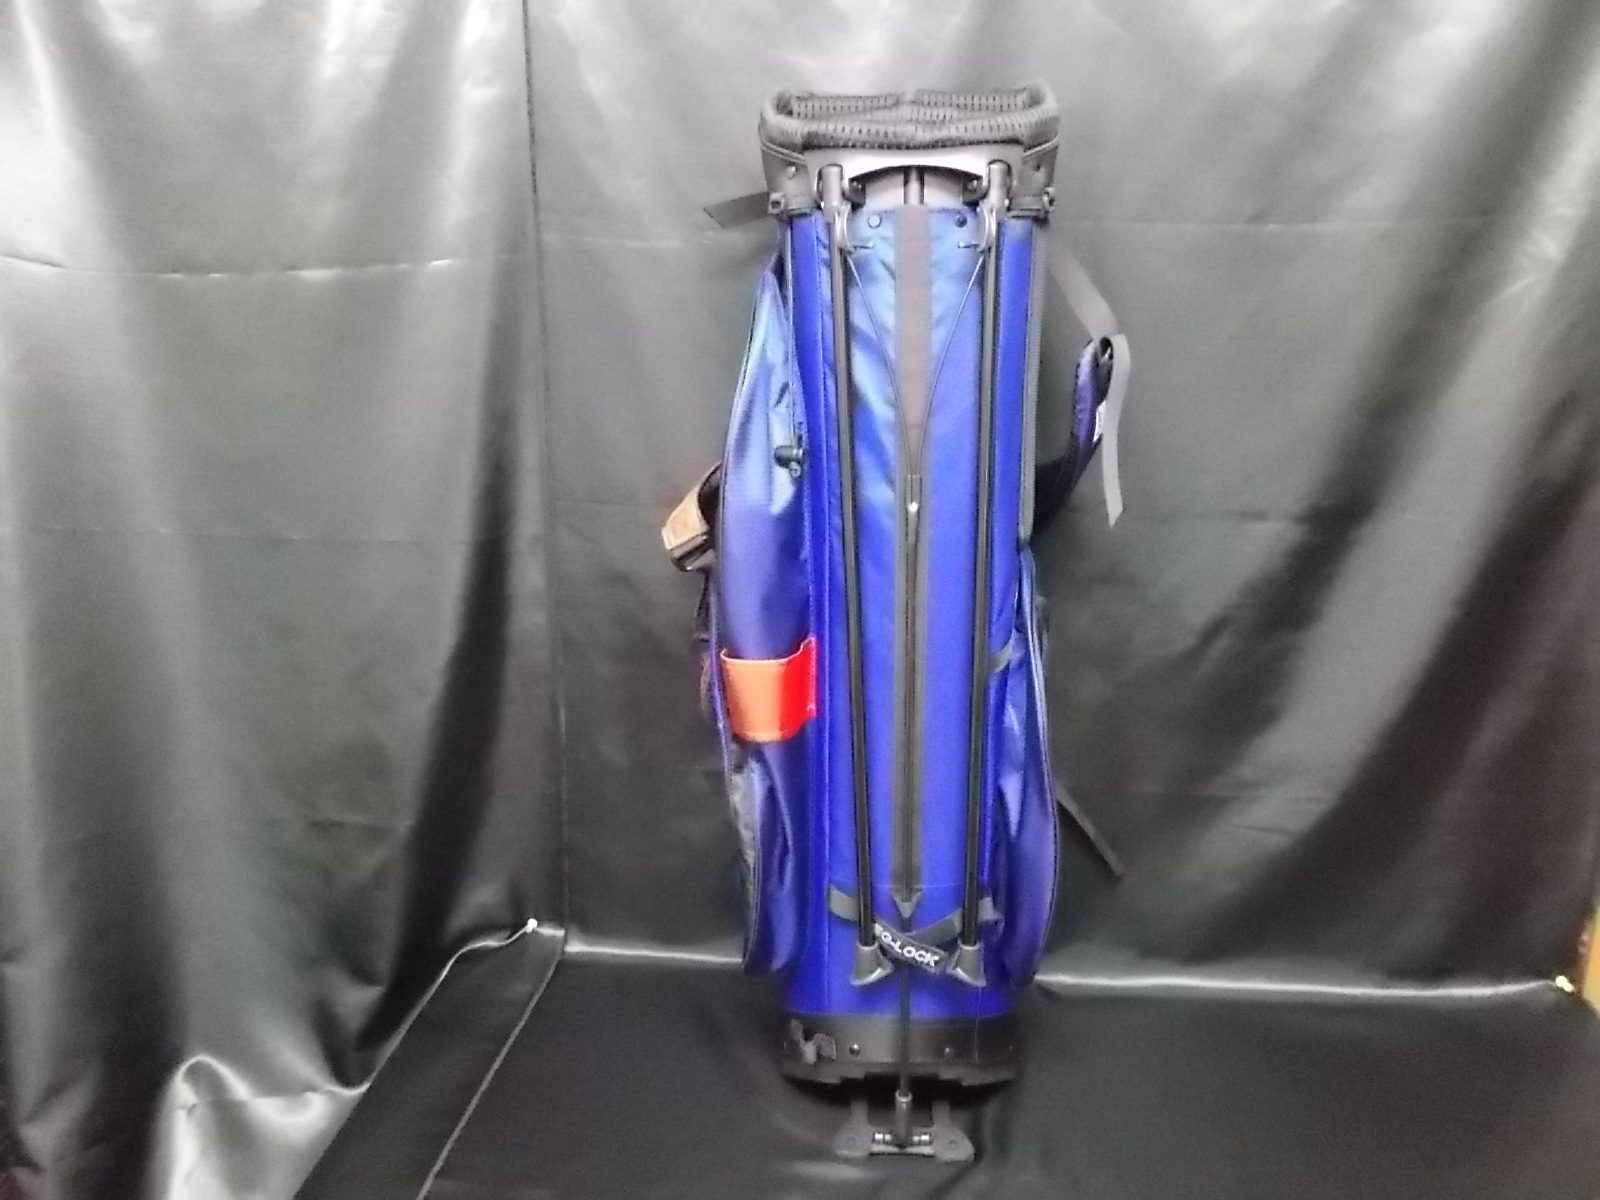 ScottyCameron 2018 Circle T Americana Ryder Cup stand bag Limited スコッティキャメロン 2018 ライダーカップ記念 アメリカーナ スタンドバッグ